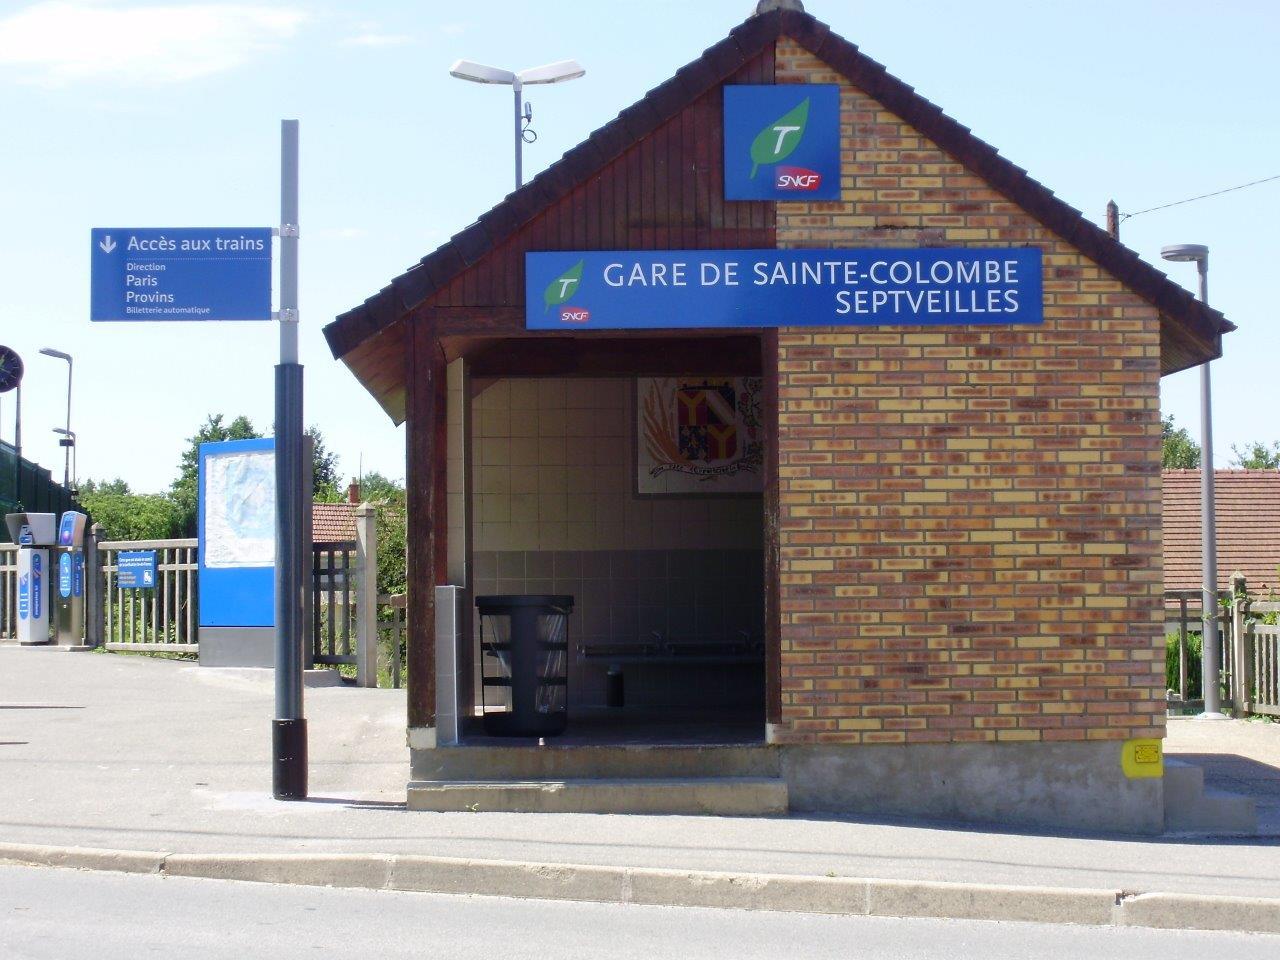 gare-de-sainte-colombe-septveilles-train-station